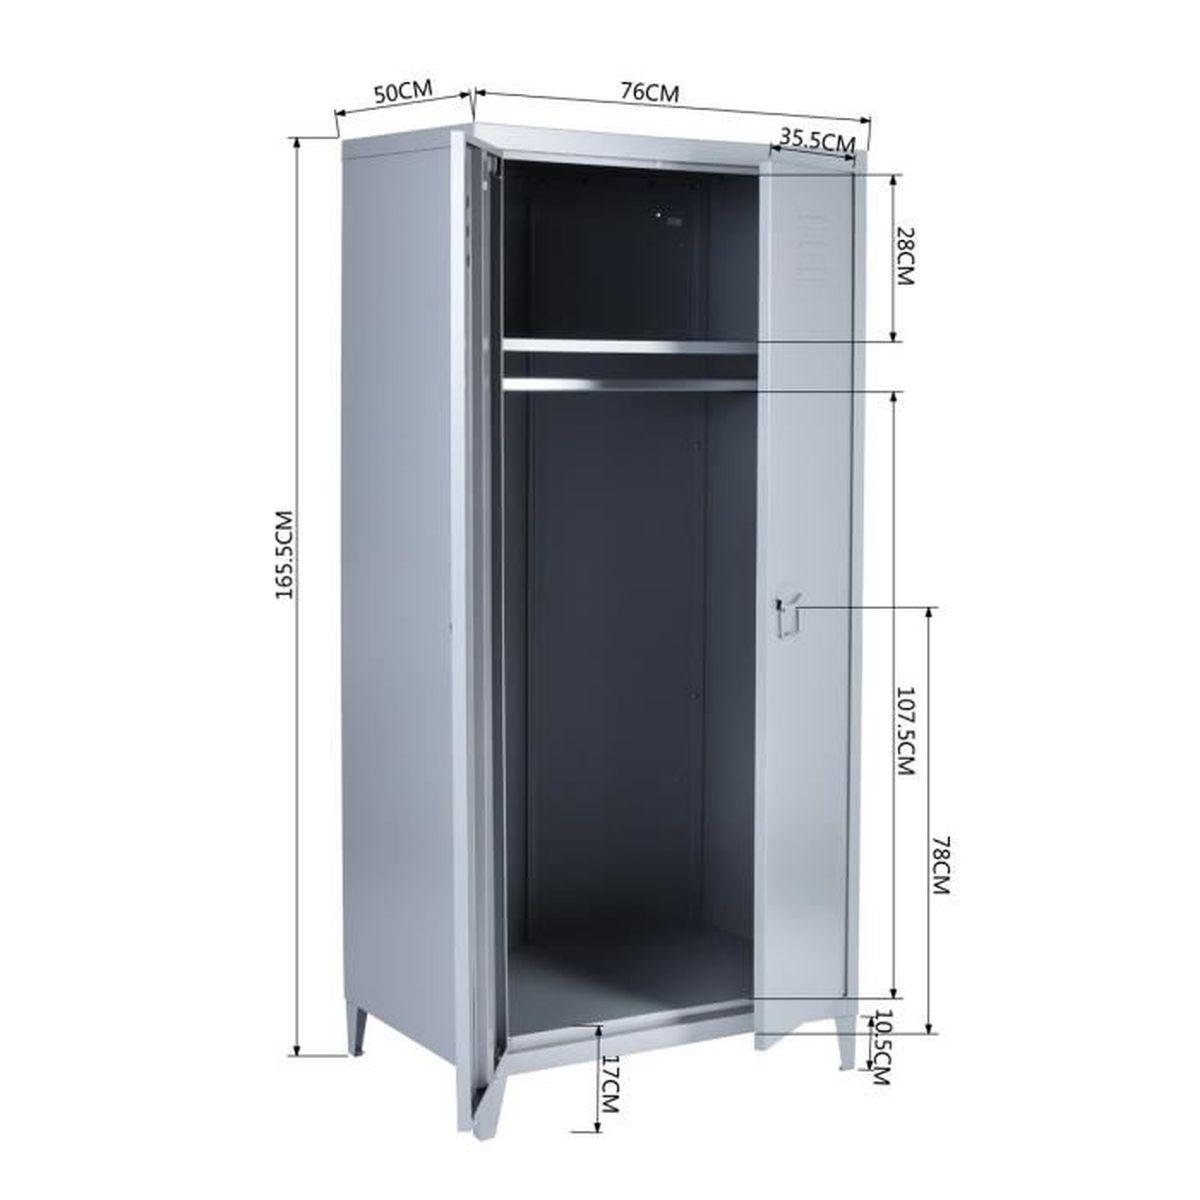 Meuble Dressing Pas Cher dressing 2 portes en métal, meuble range-balai armoire